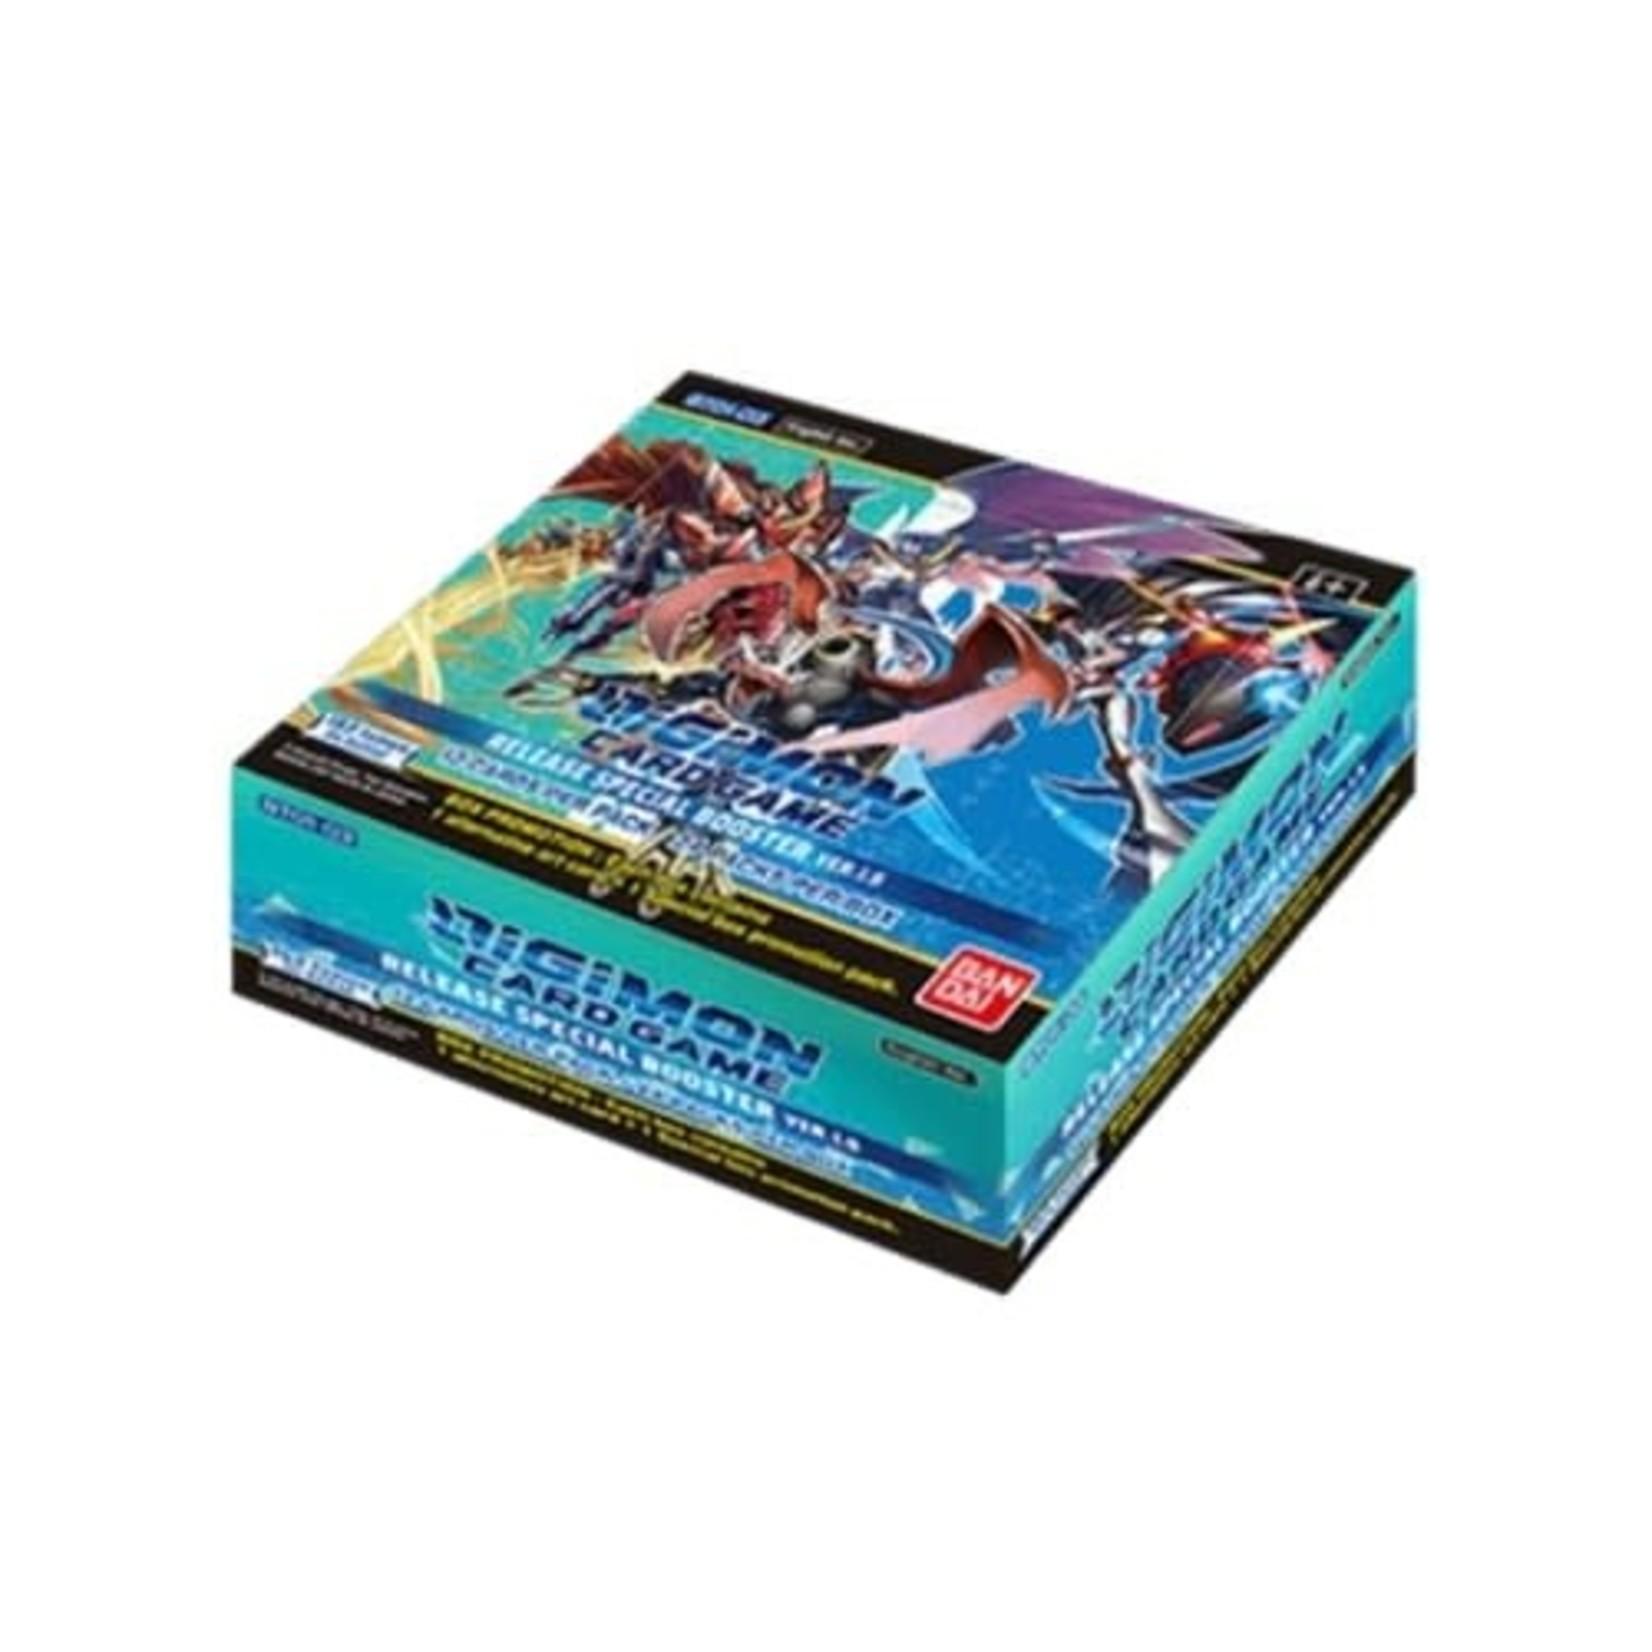 Bandai Digimon Trading Card Game: V1.5 Booster Box